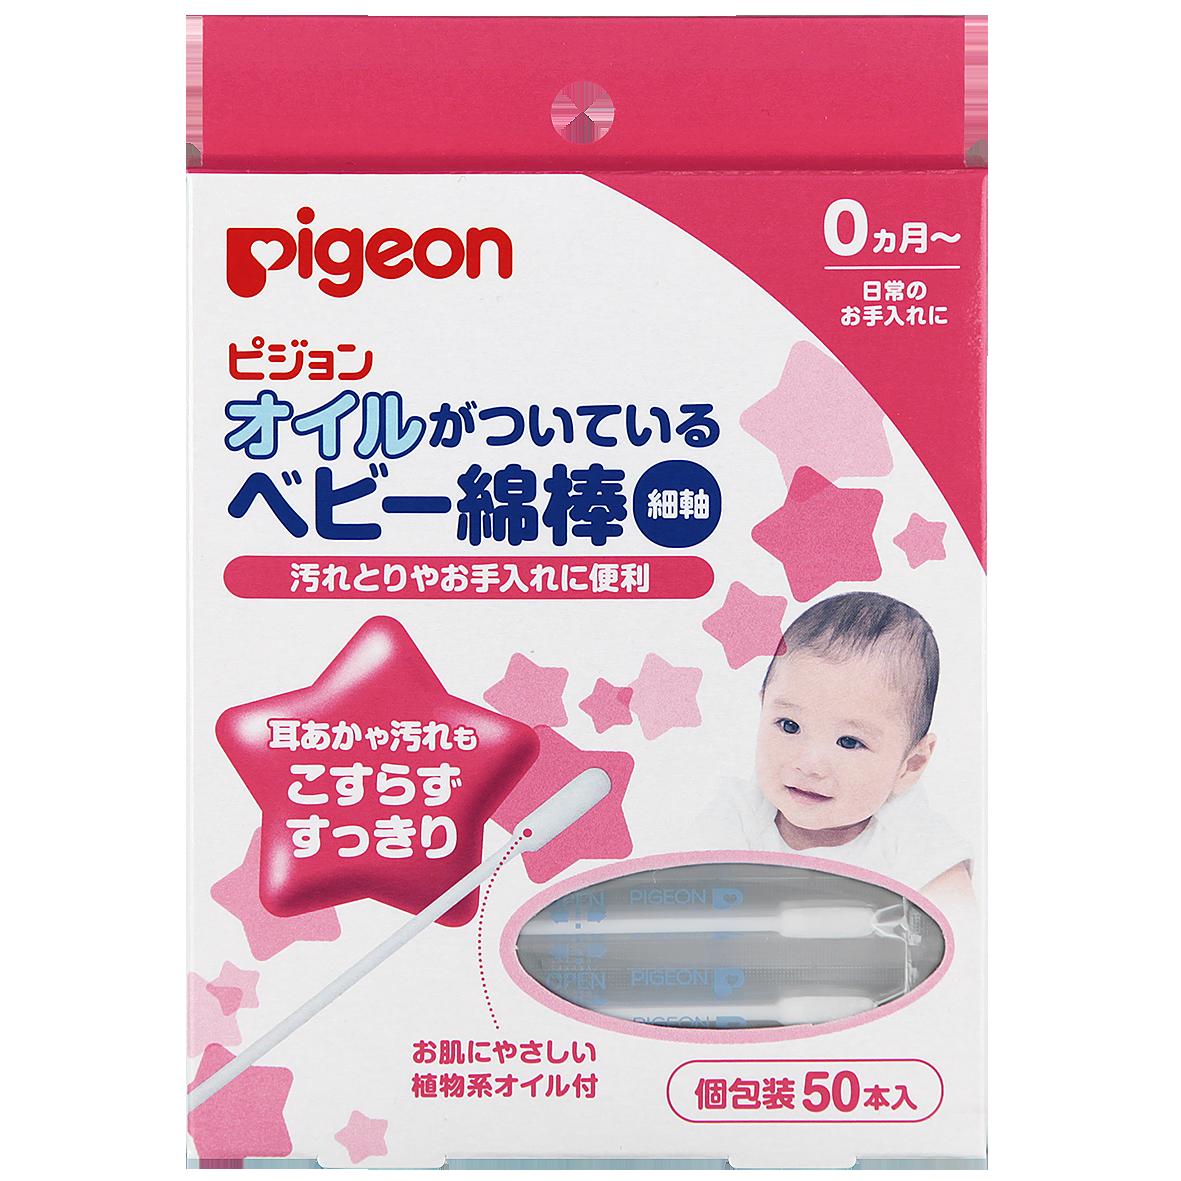 ������ ������� Pigeon 50 �� (� �������� ���������) � 0 ���